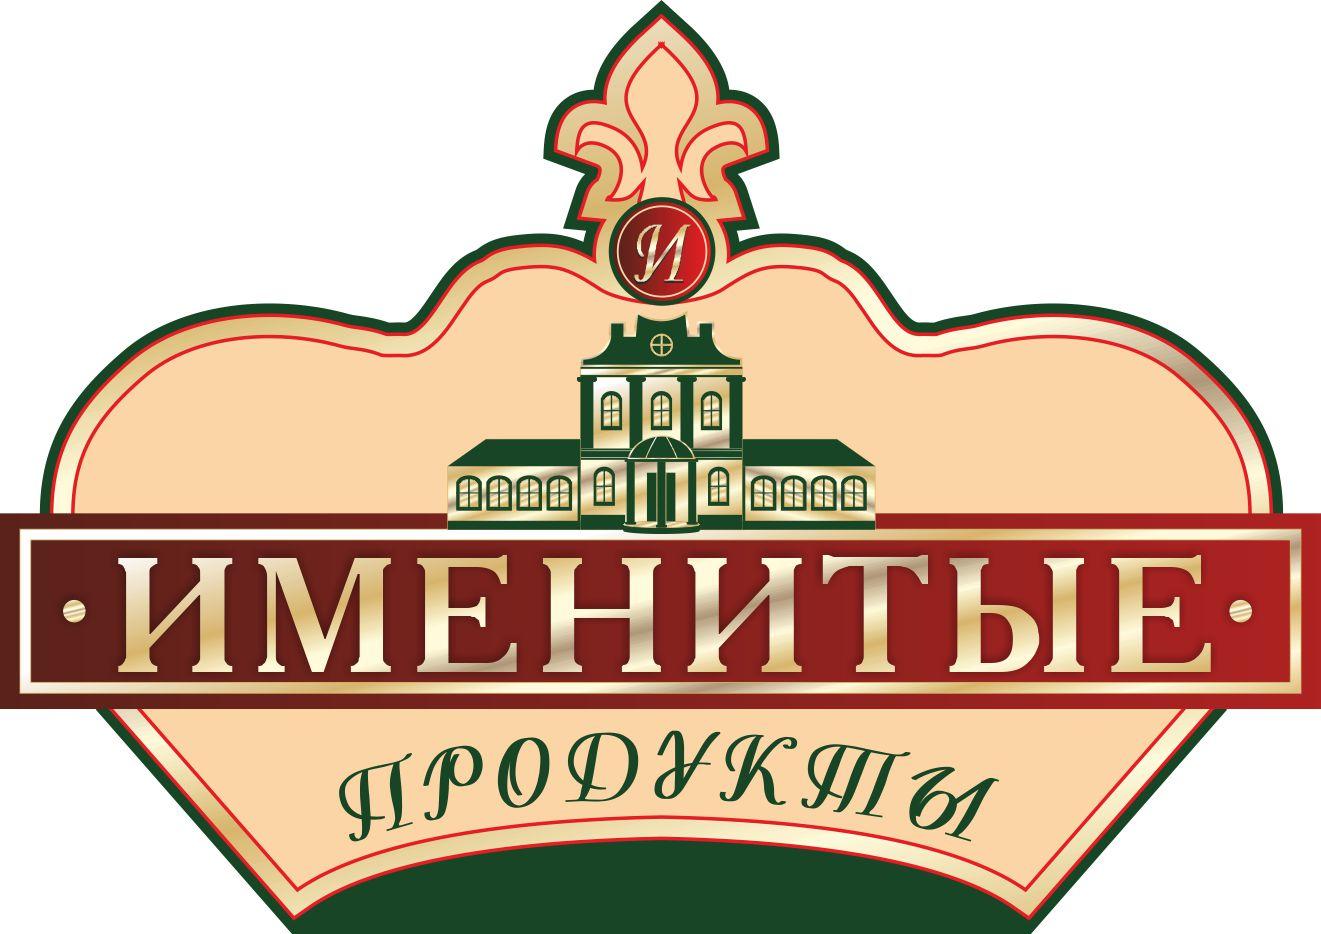 Логотип и фирменный стиль продуктов питания фото f_7255bbdb6a3a2bfd.jpg